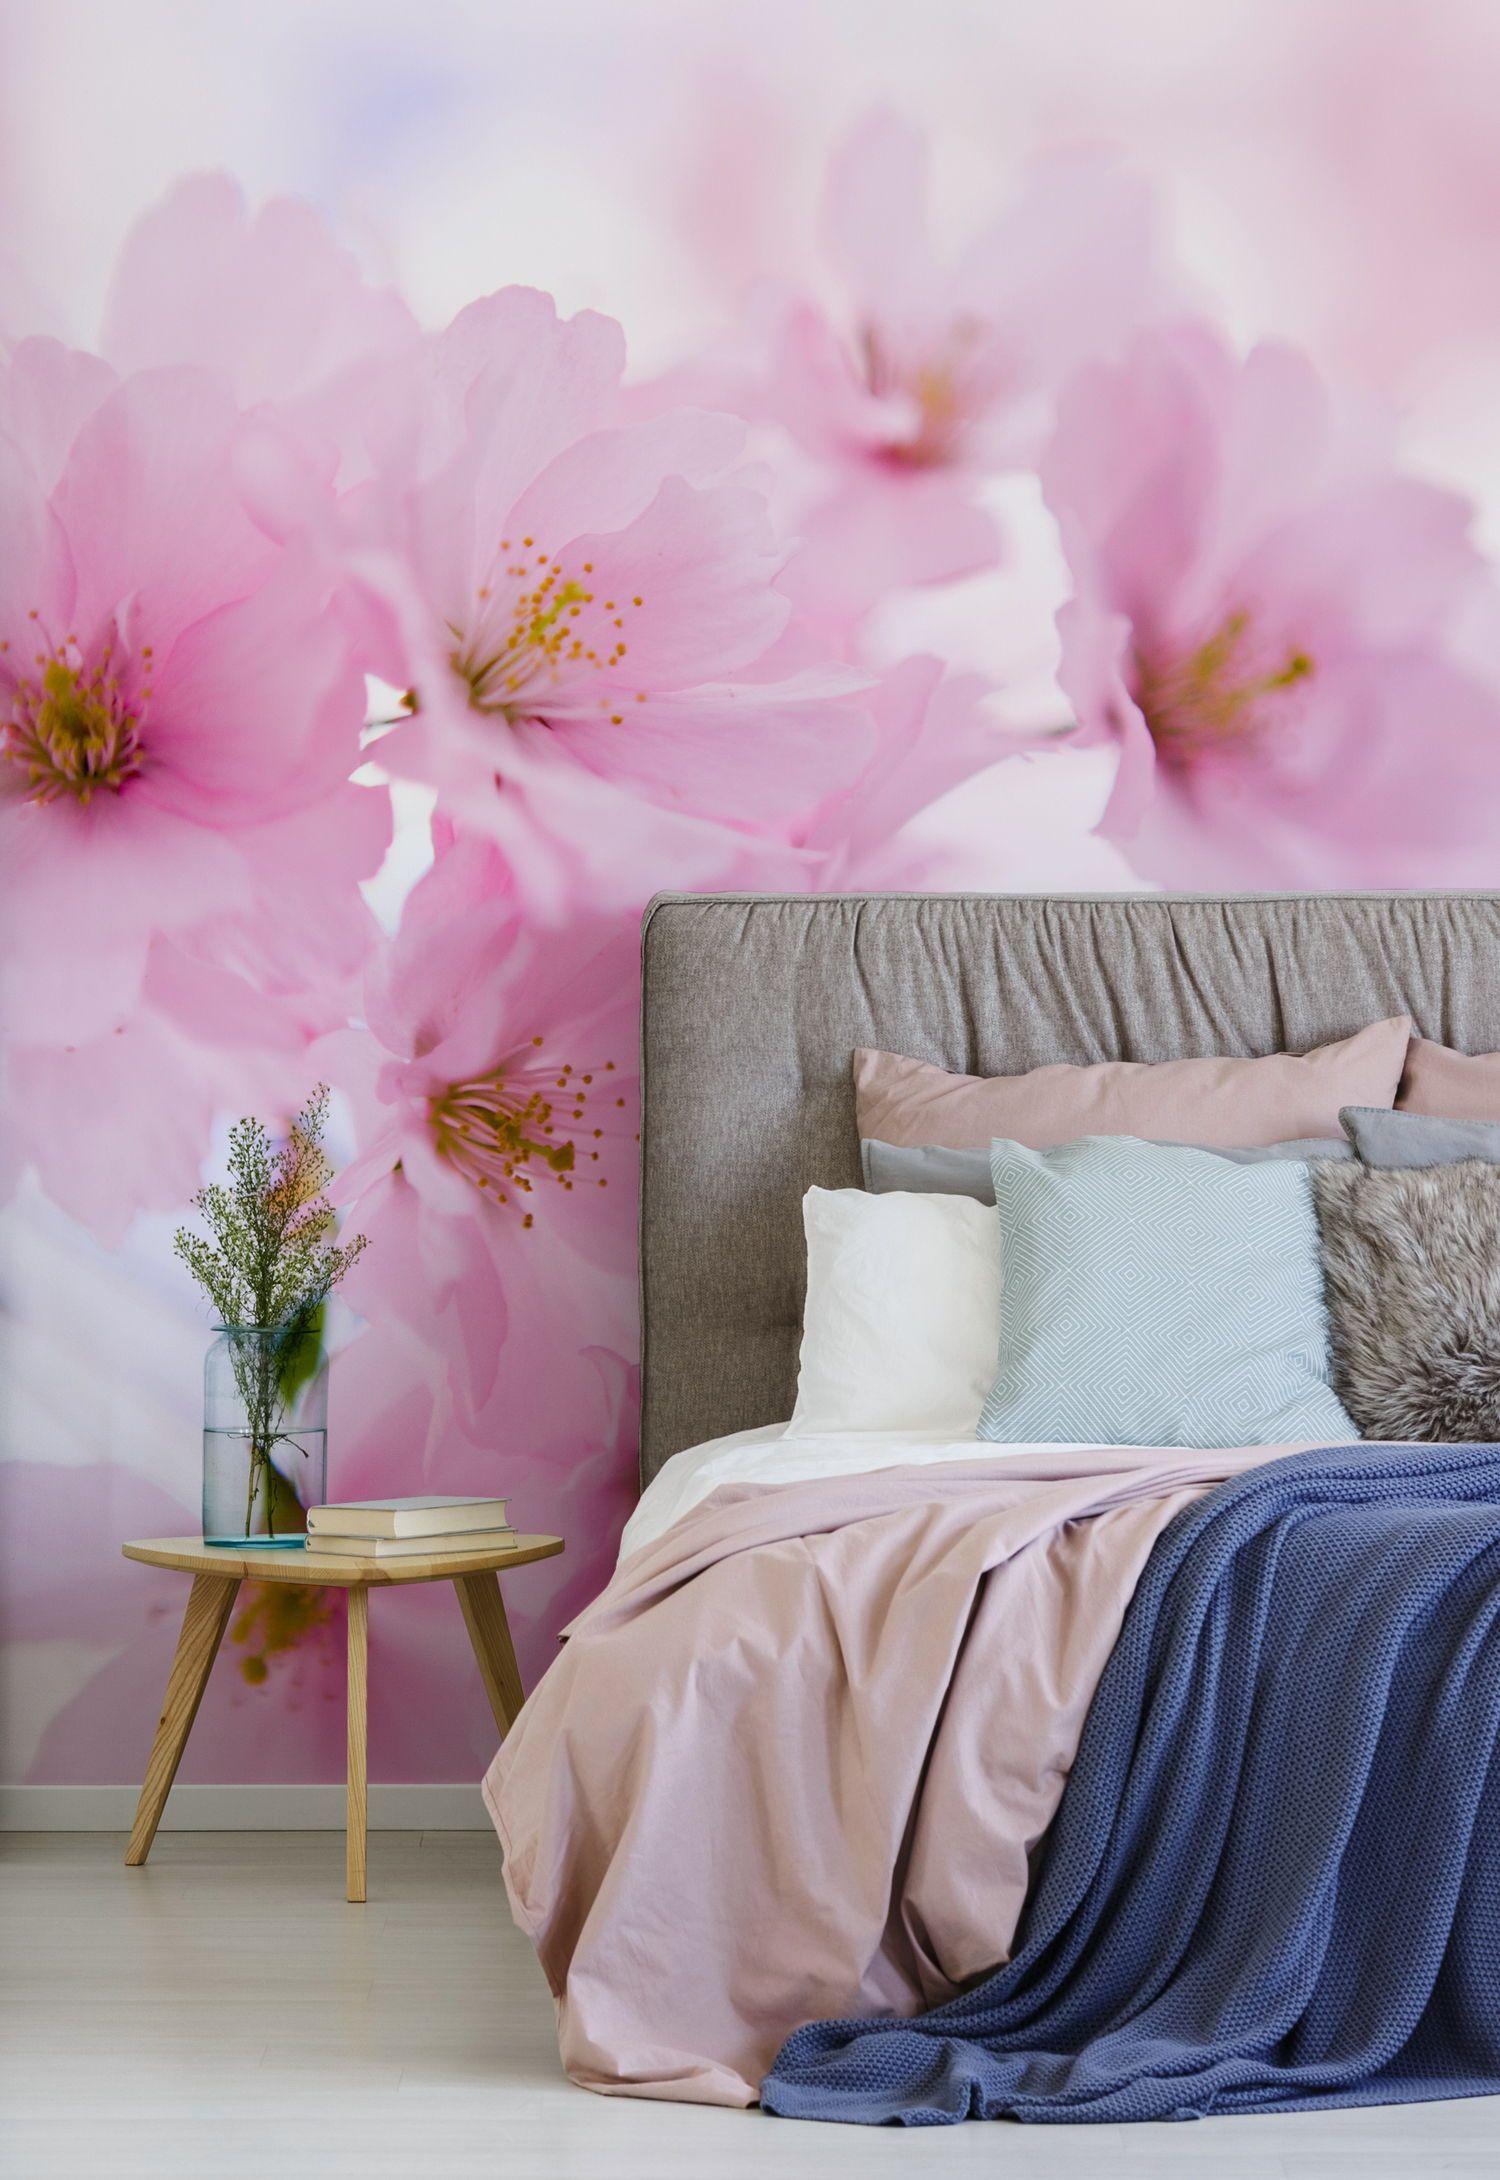 Japanese Cherry Tree In Blossom Wallpaper Mural Wallsauce Eu Decor Japanese Cherry Tree Home Decor